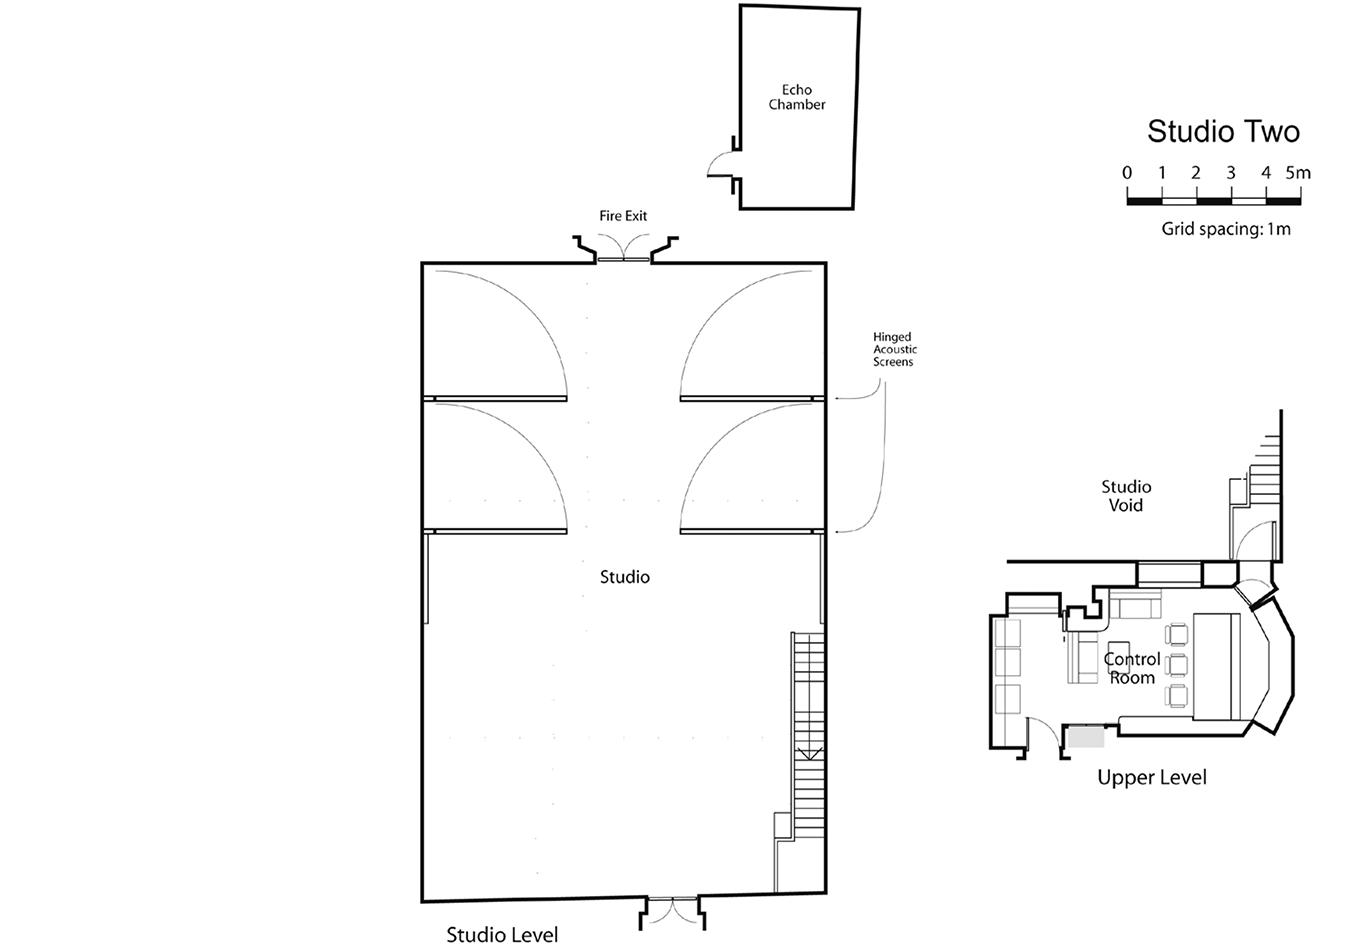 Studio Two Floorplan